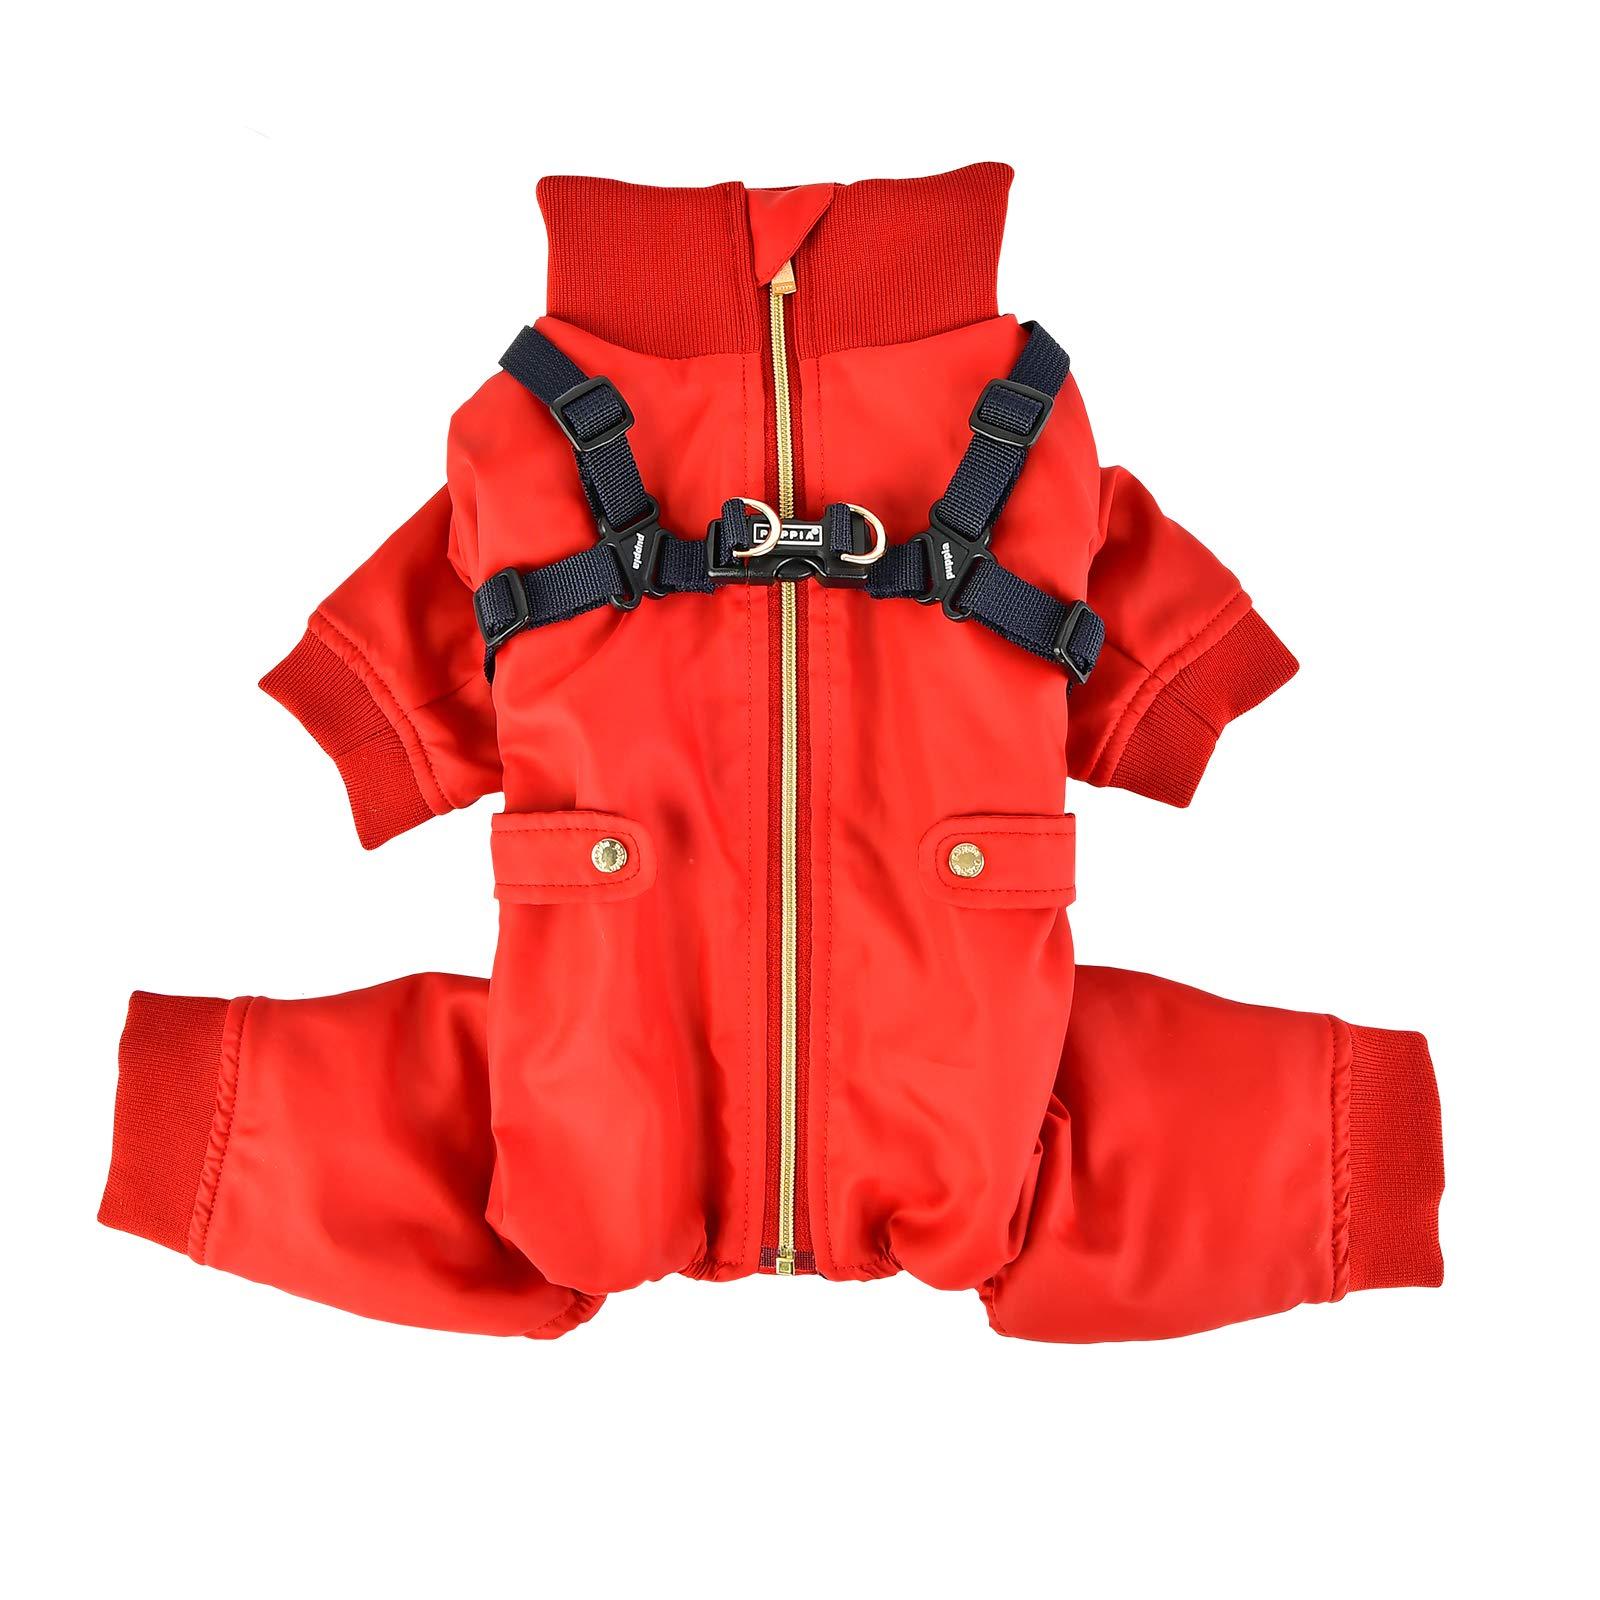 Puppia PLSD-JP1663-RD-S Garnet Pet Coat, Red, Small